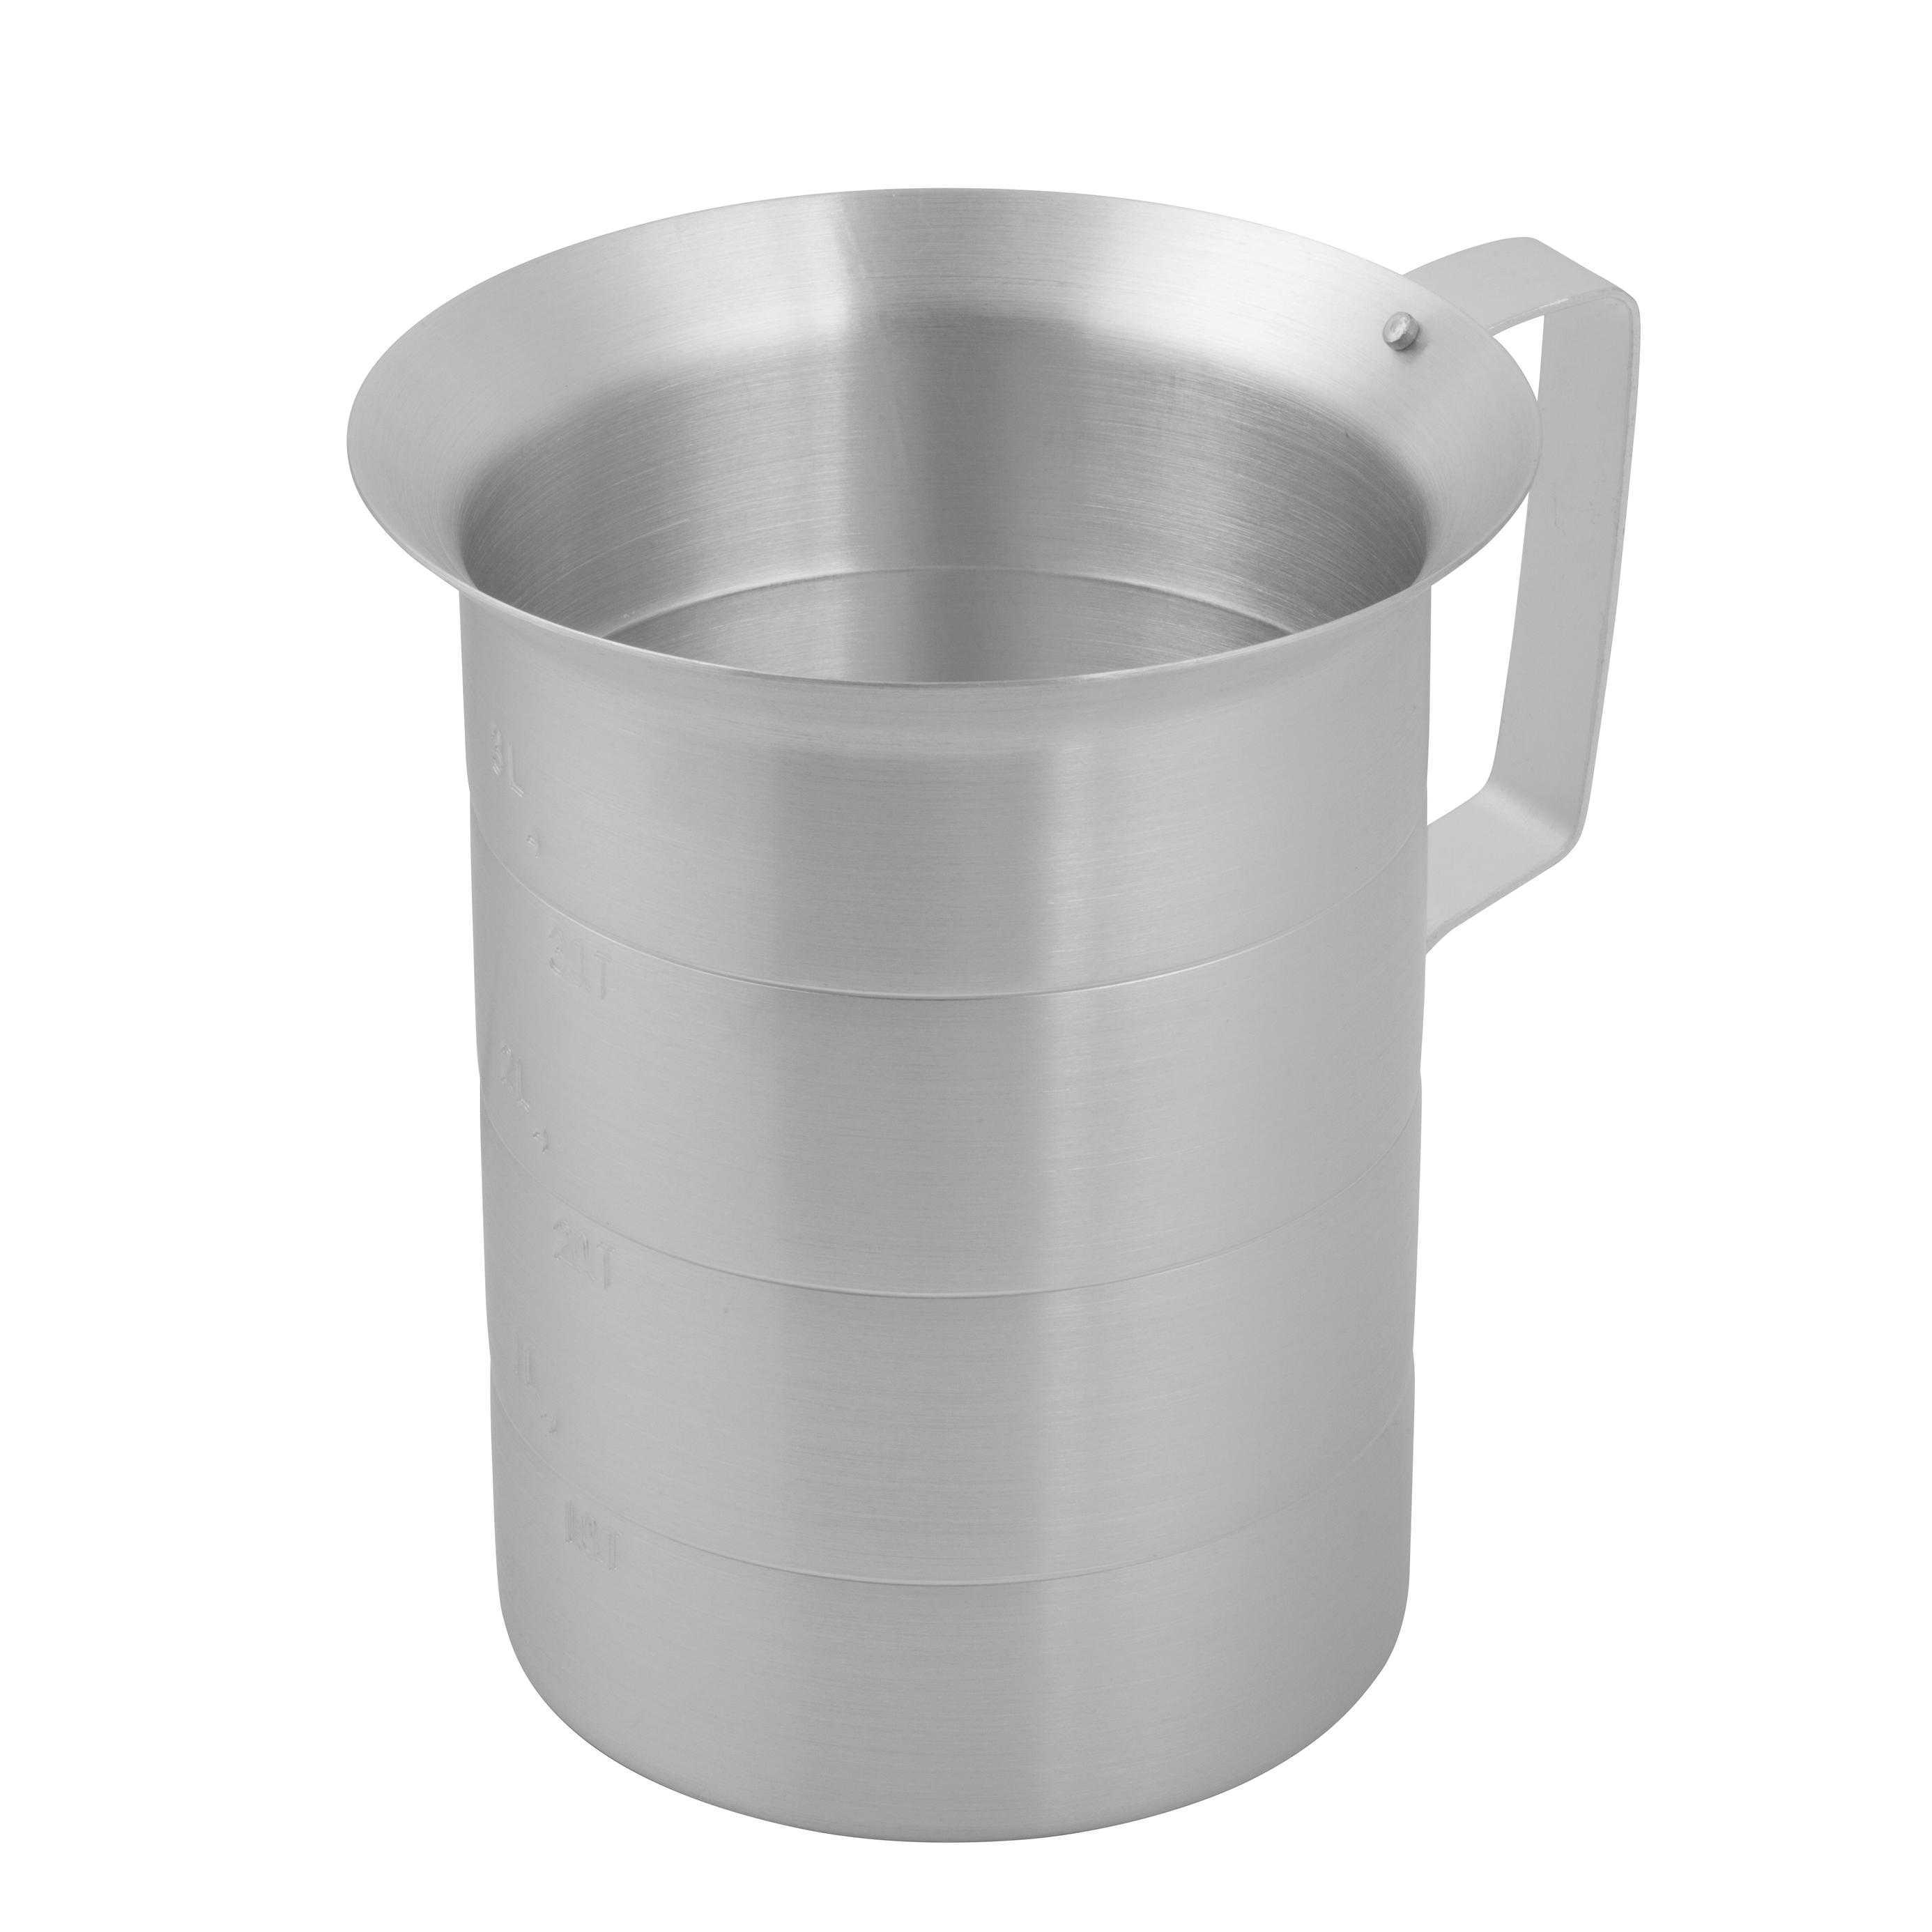 1750-15 Winco AM-4 measuring cups